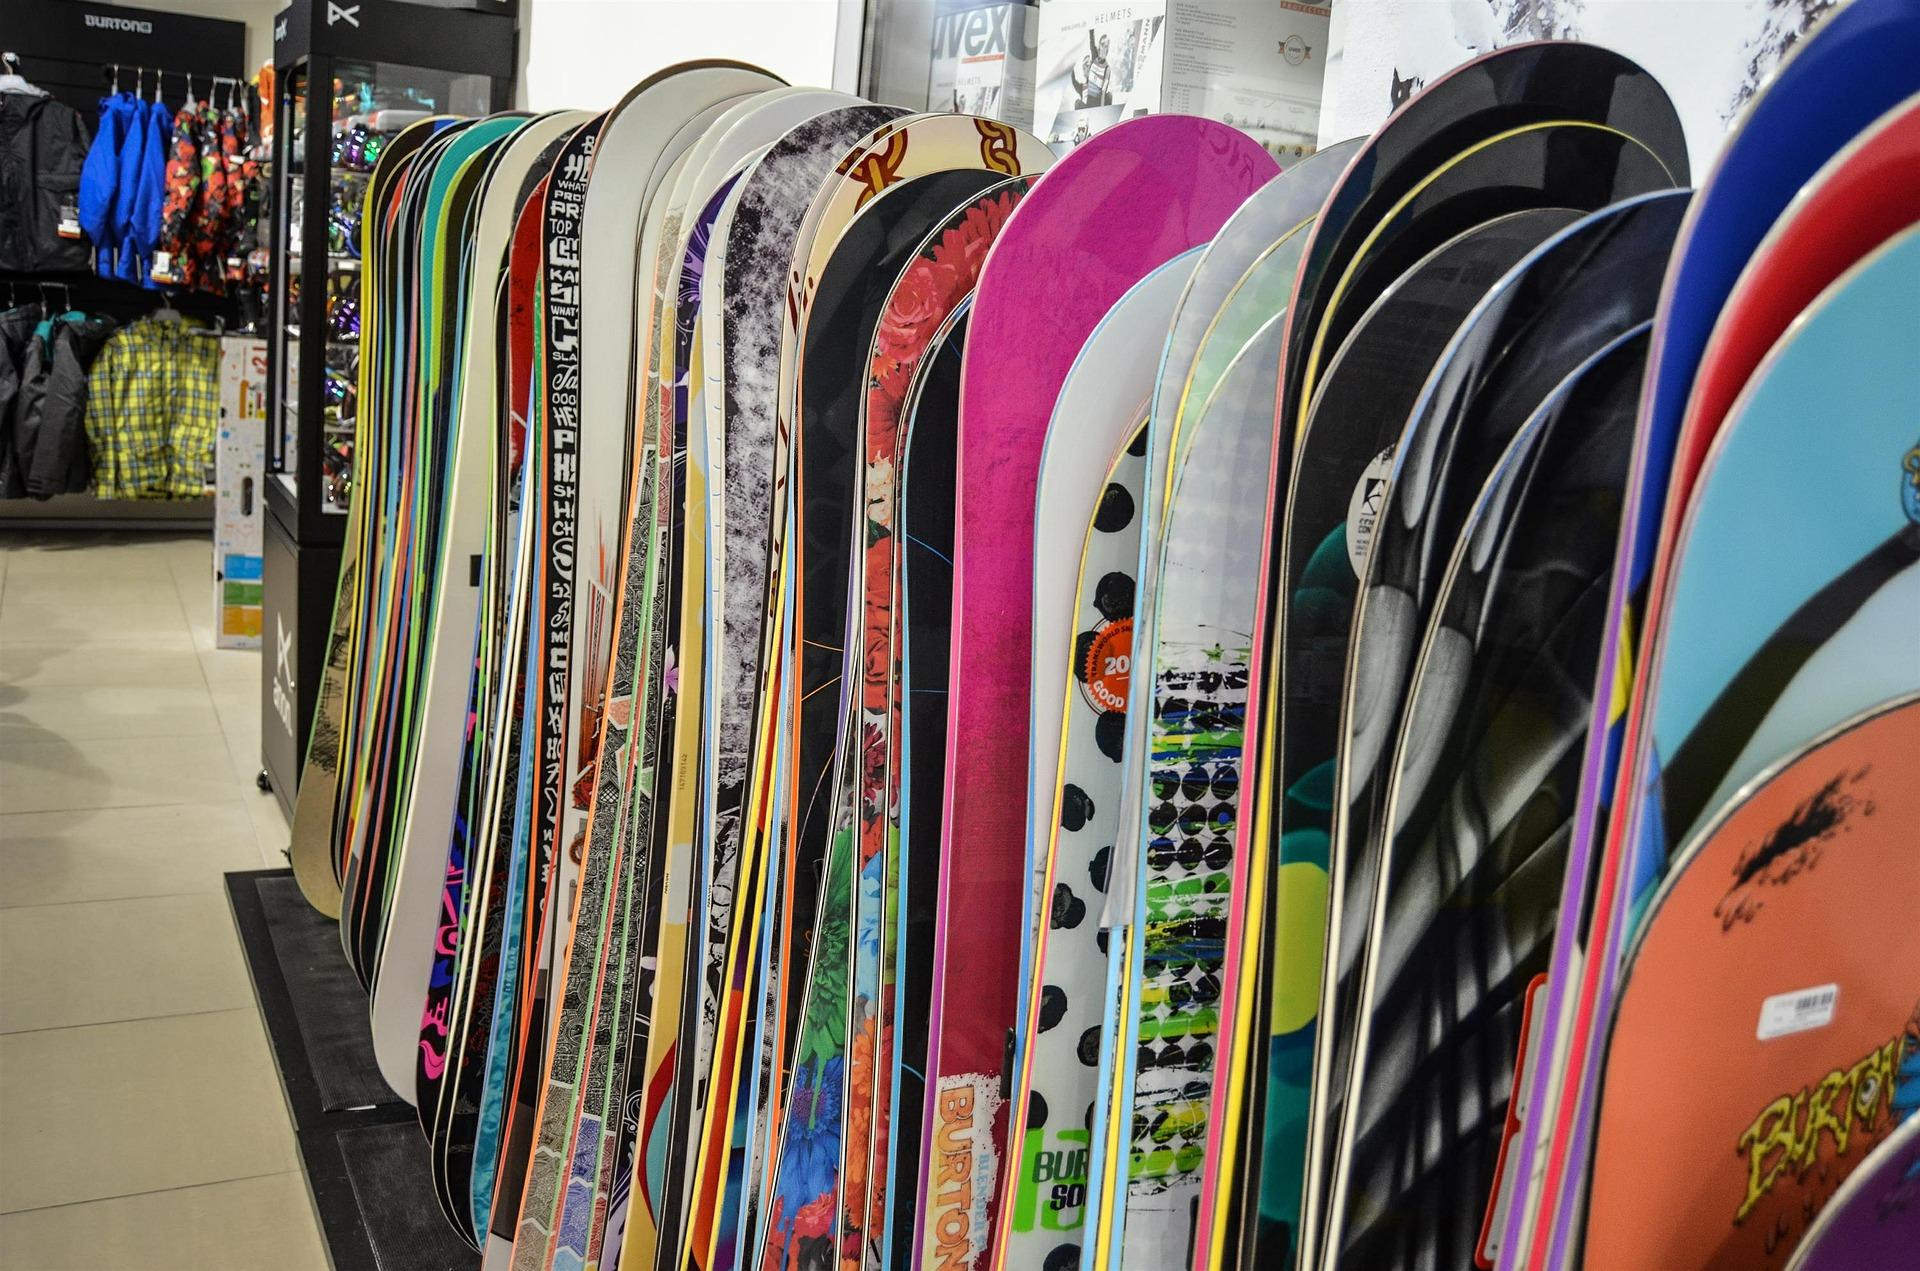 snowboarding-428612_1920.jpg